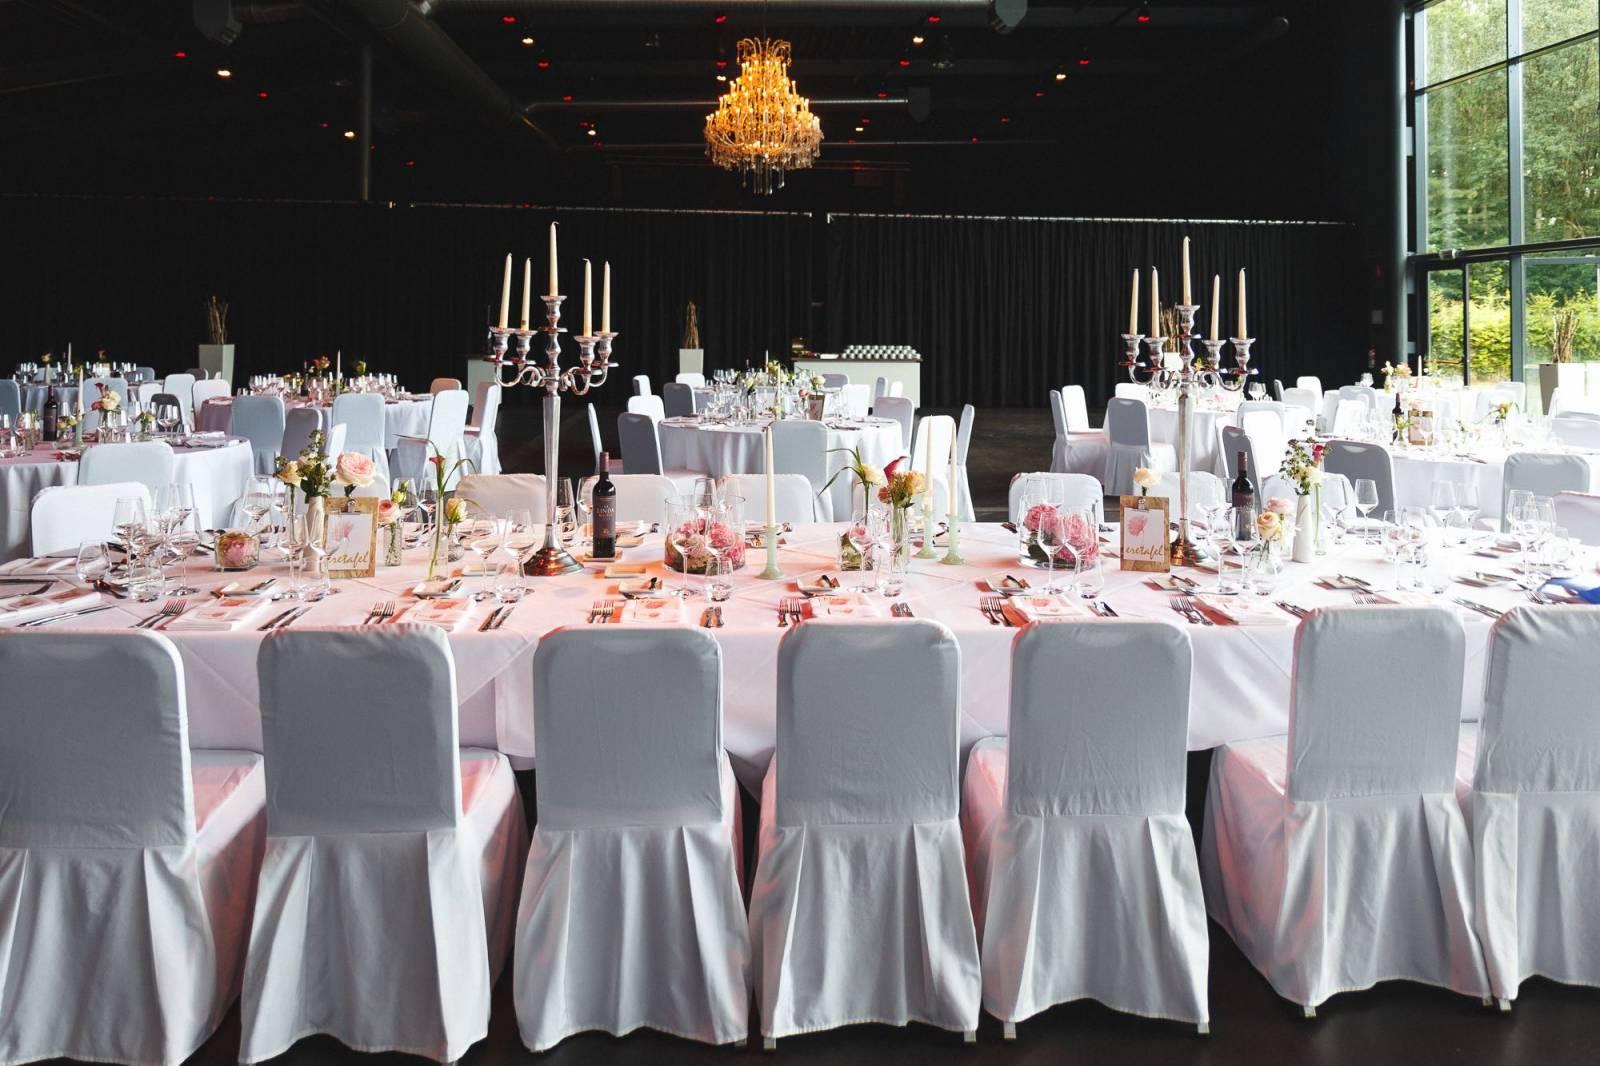 Hangar 58 - Feestzaal - House of Weddings - 5